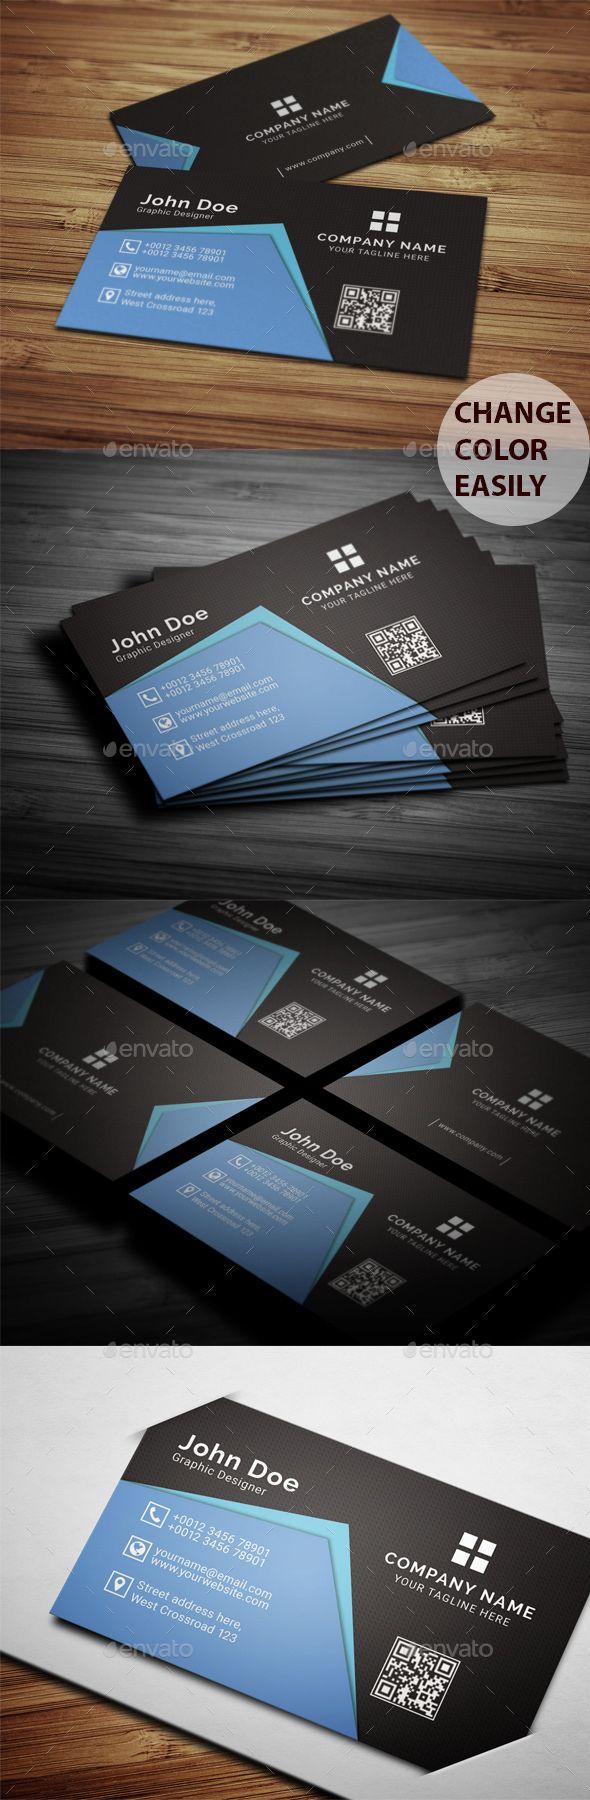 Creative personal business card minimal business card pinterest creative personal business card professional company download here httpsgraphicriveritemcreative personal business card 20760634refpxcr colourmoves